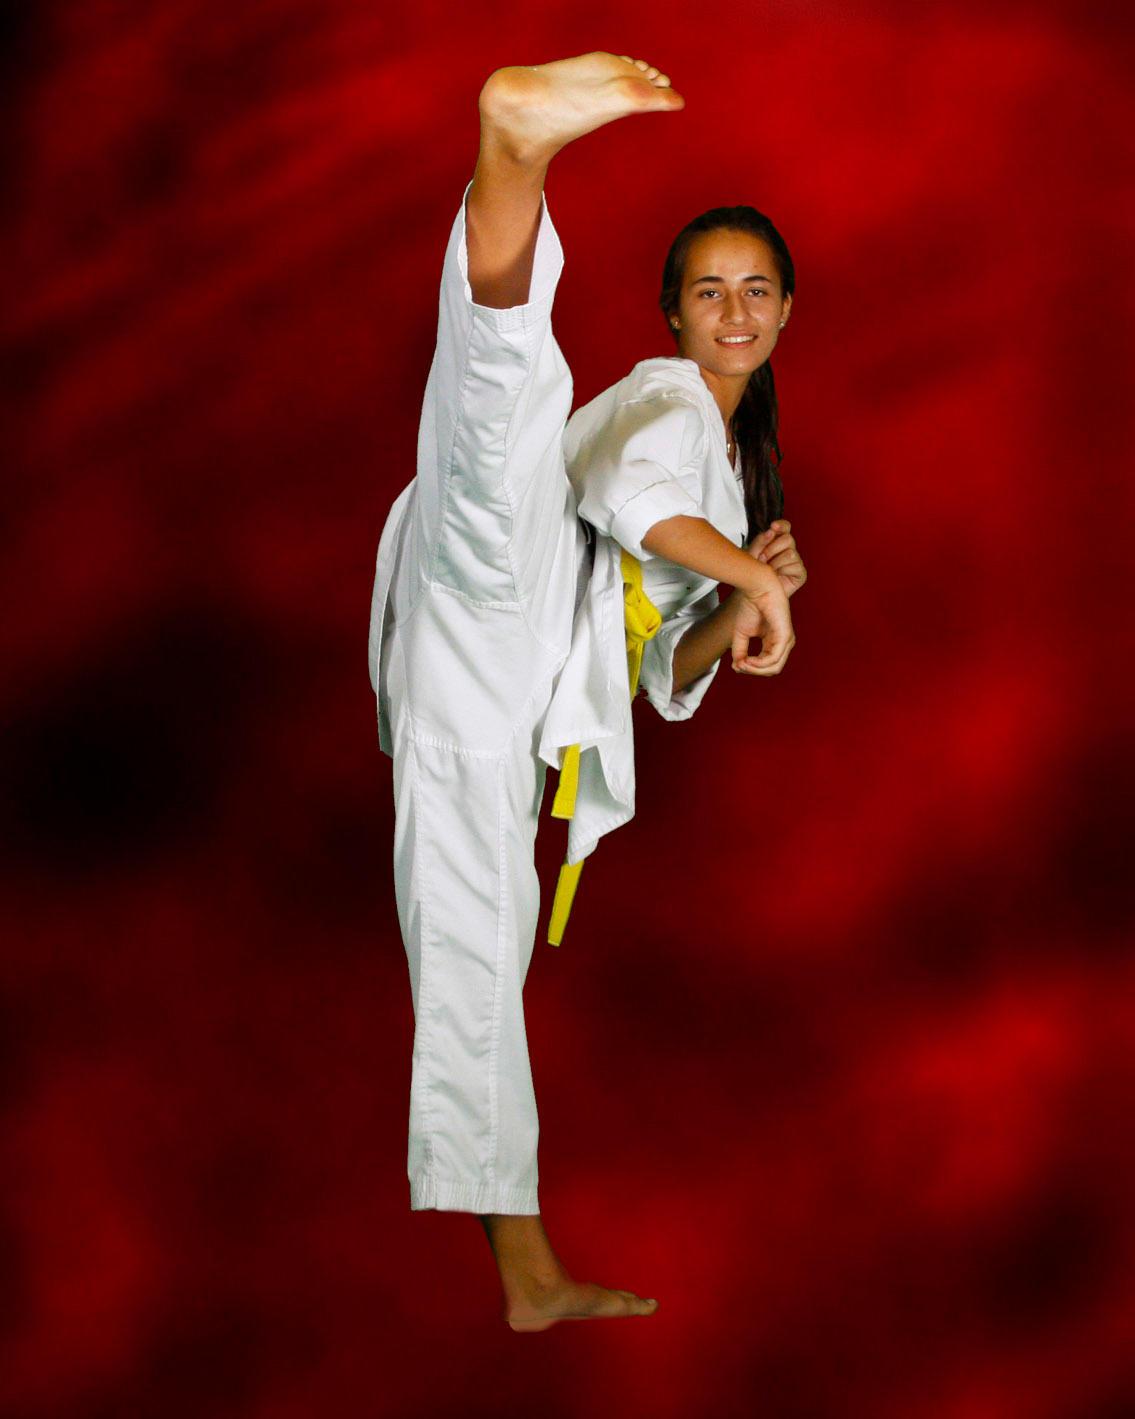 Millennium Martial Arts - Tae Kwon Do image 19